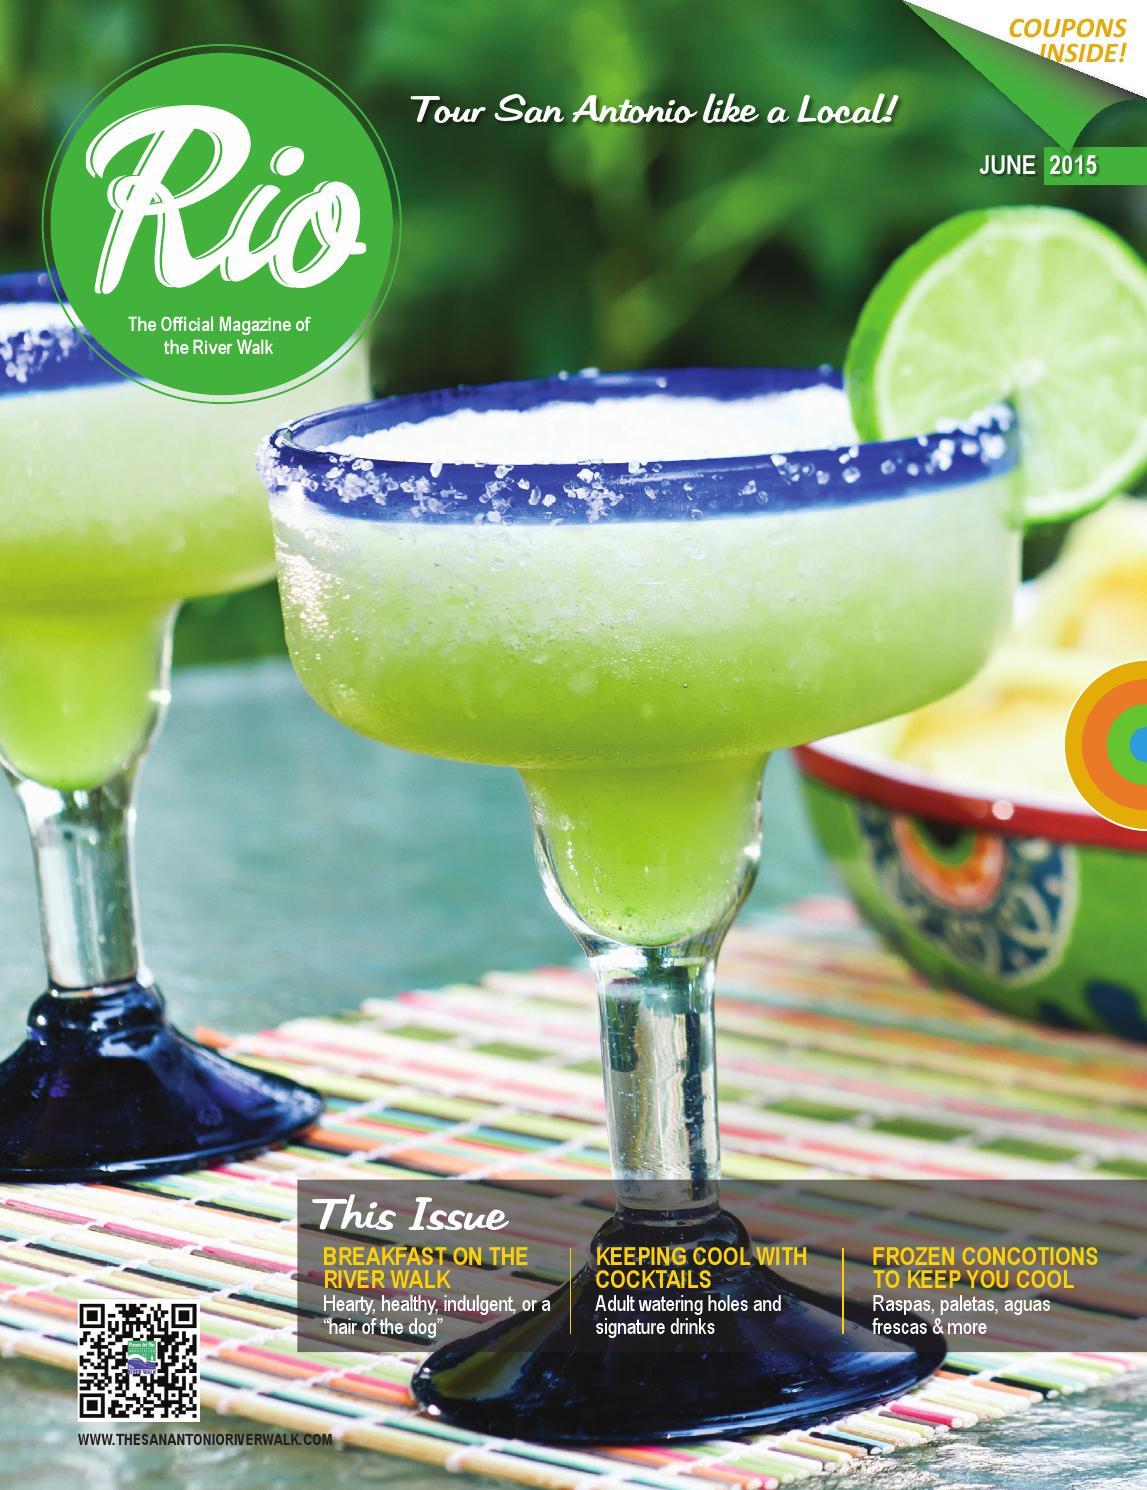 rio magazine june 2015 by traveling blender - issuu